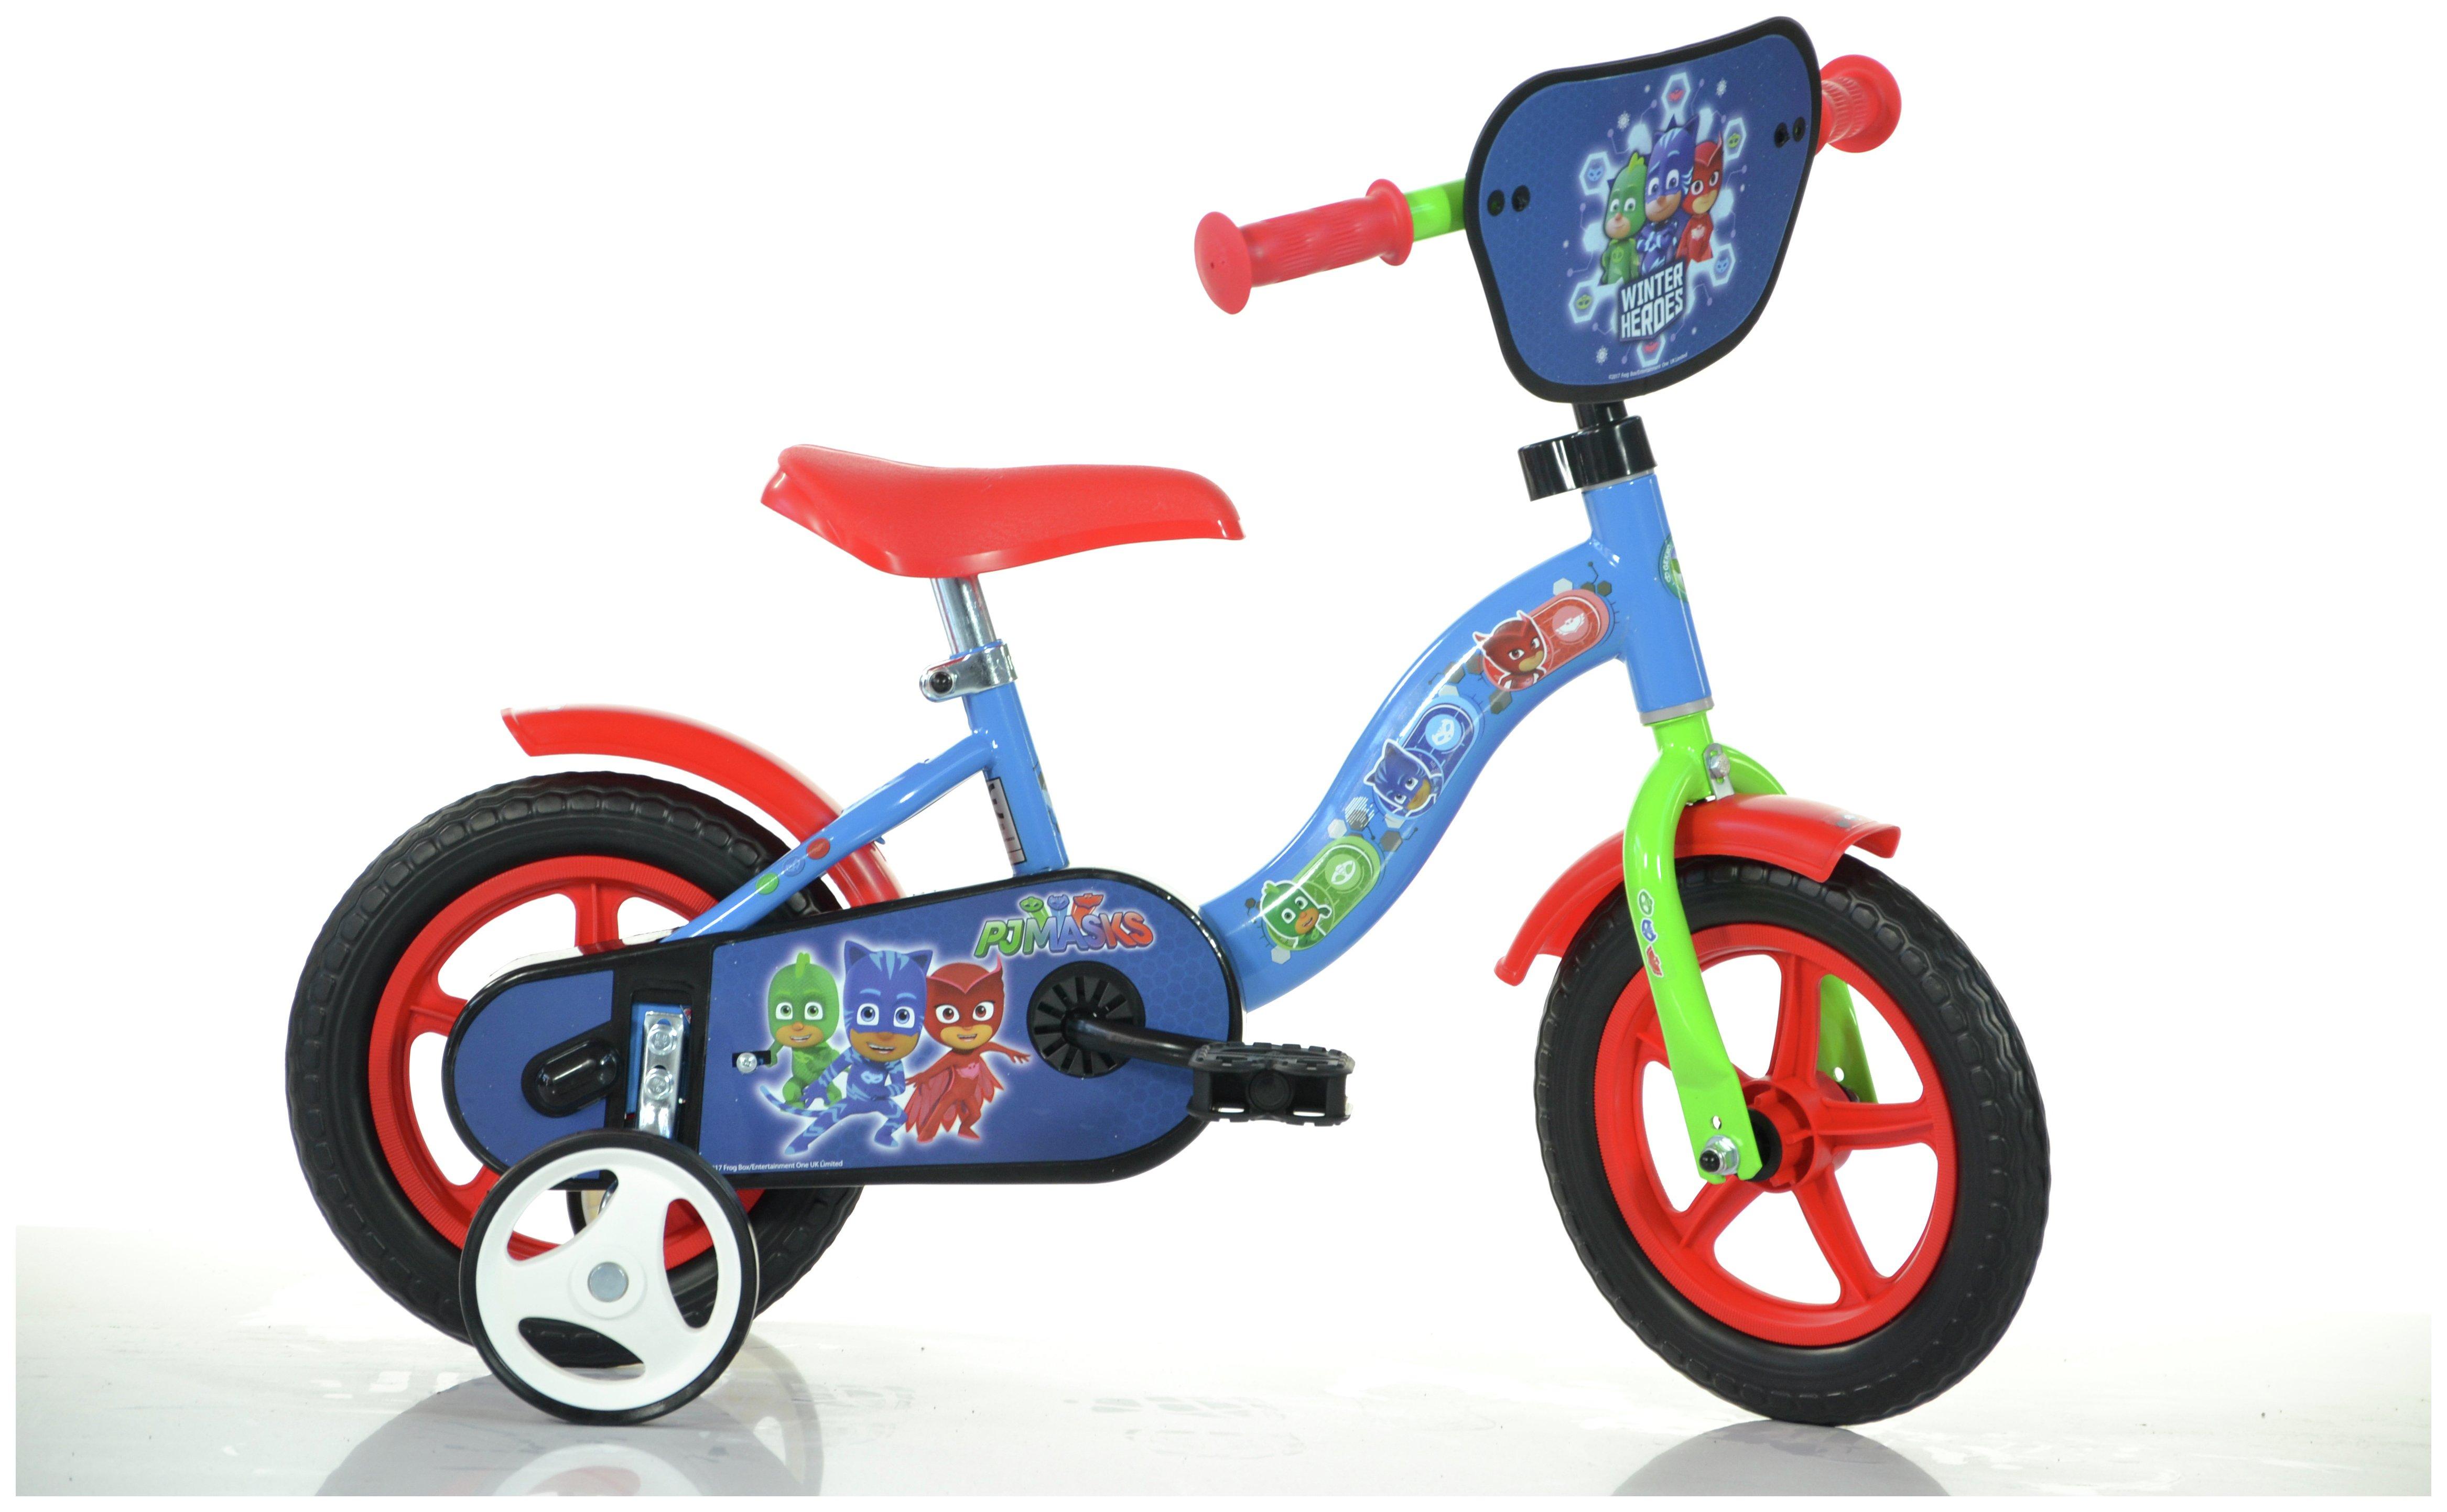 Image of Dino Bikes PJ Masks 10 Inch Bicycle.